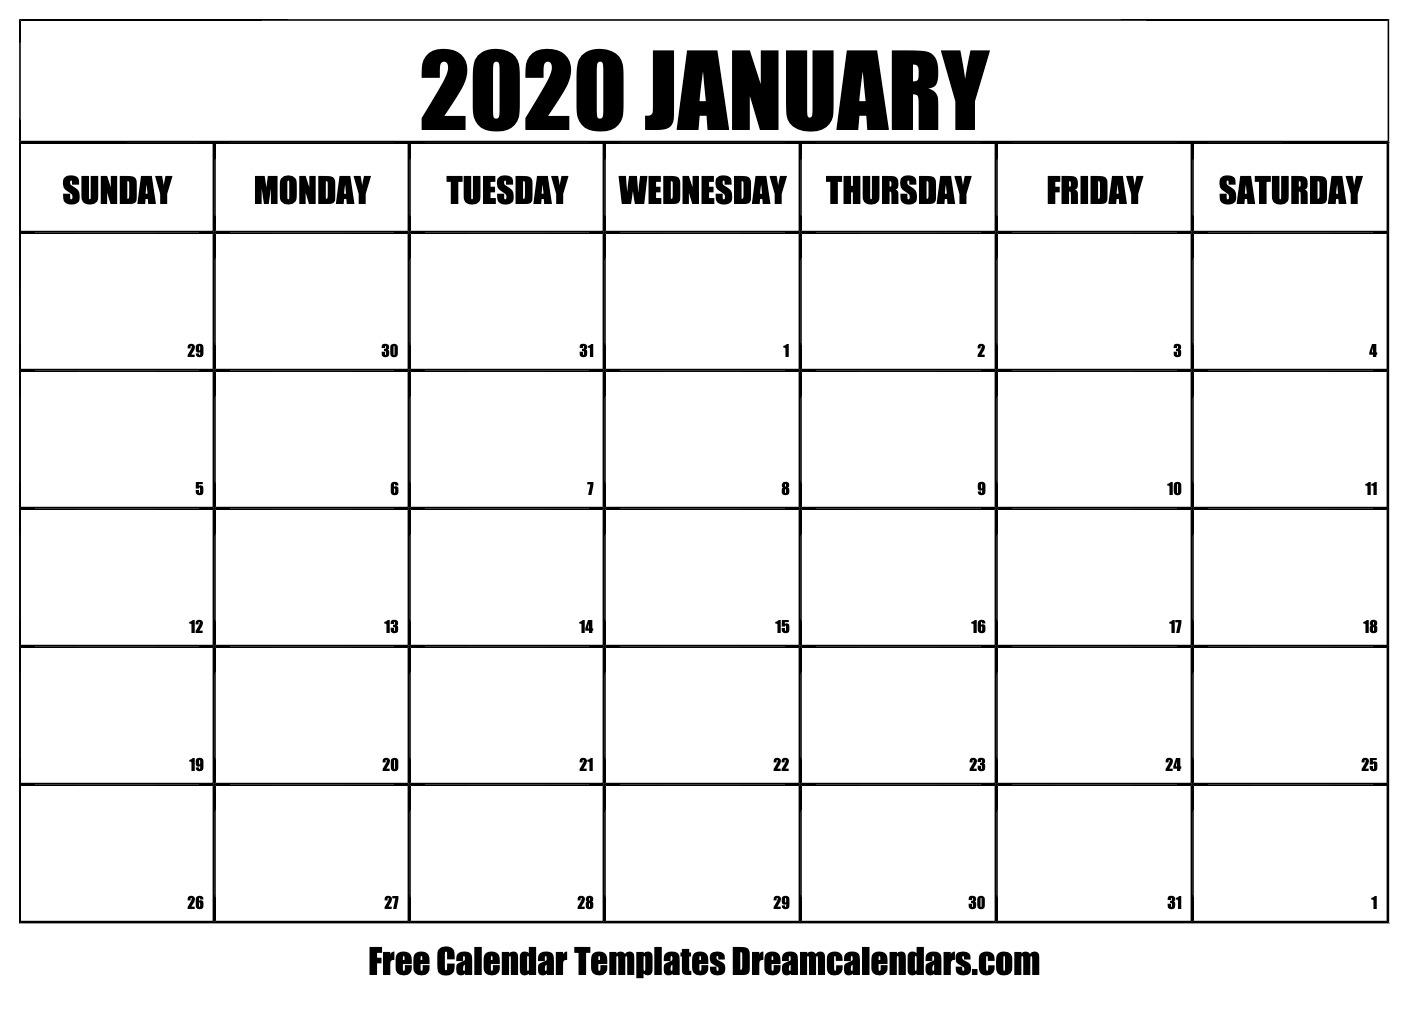 Printable January 2020 Calendar with regard to Printable 2020 Calendar I Can Edit